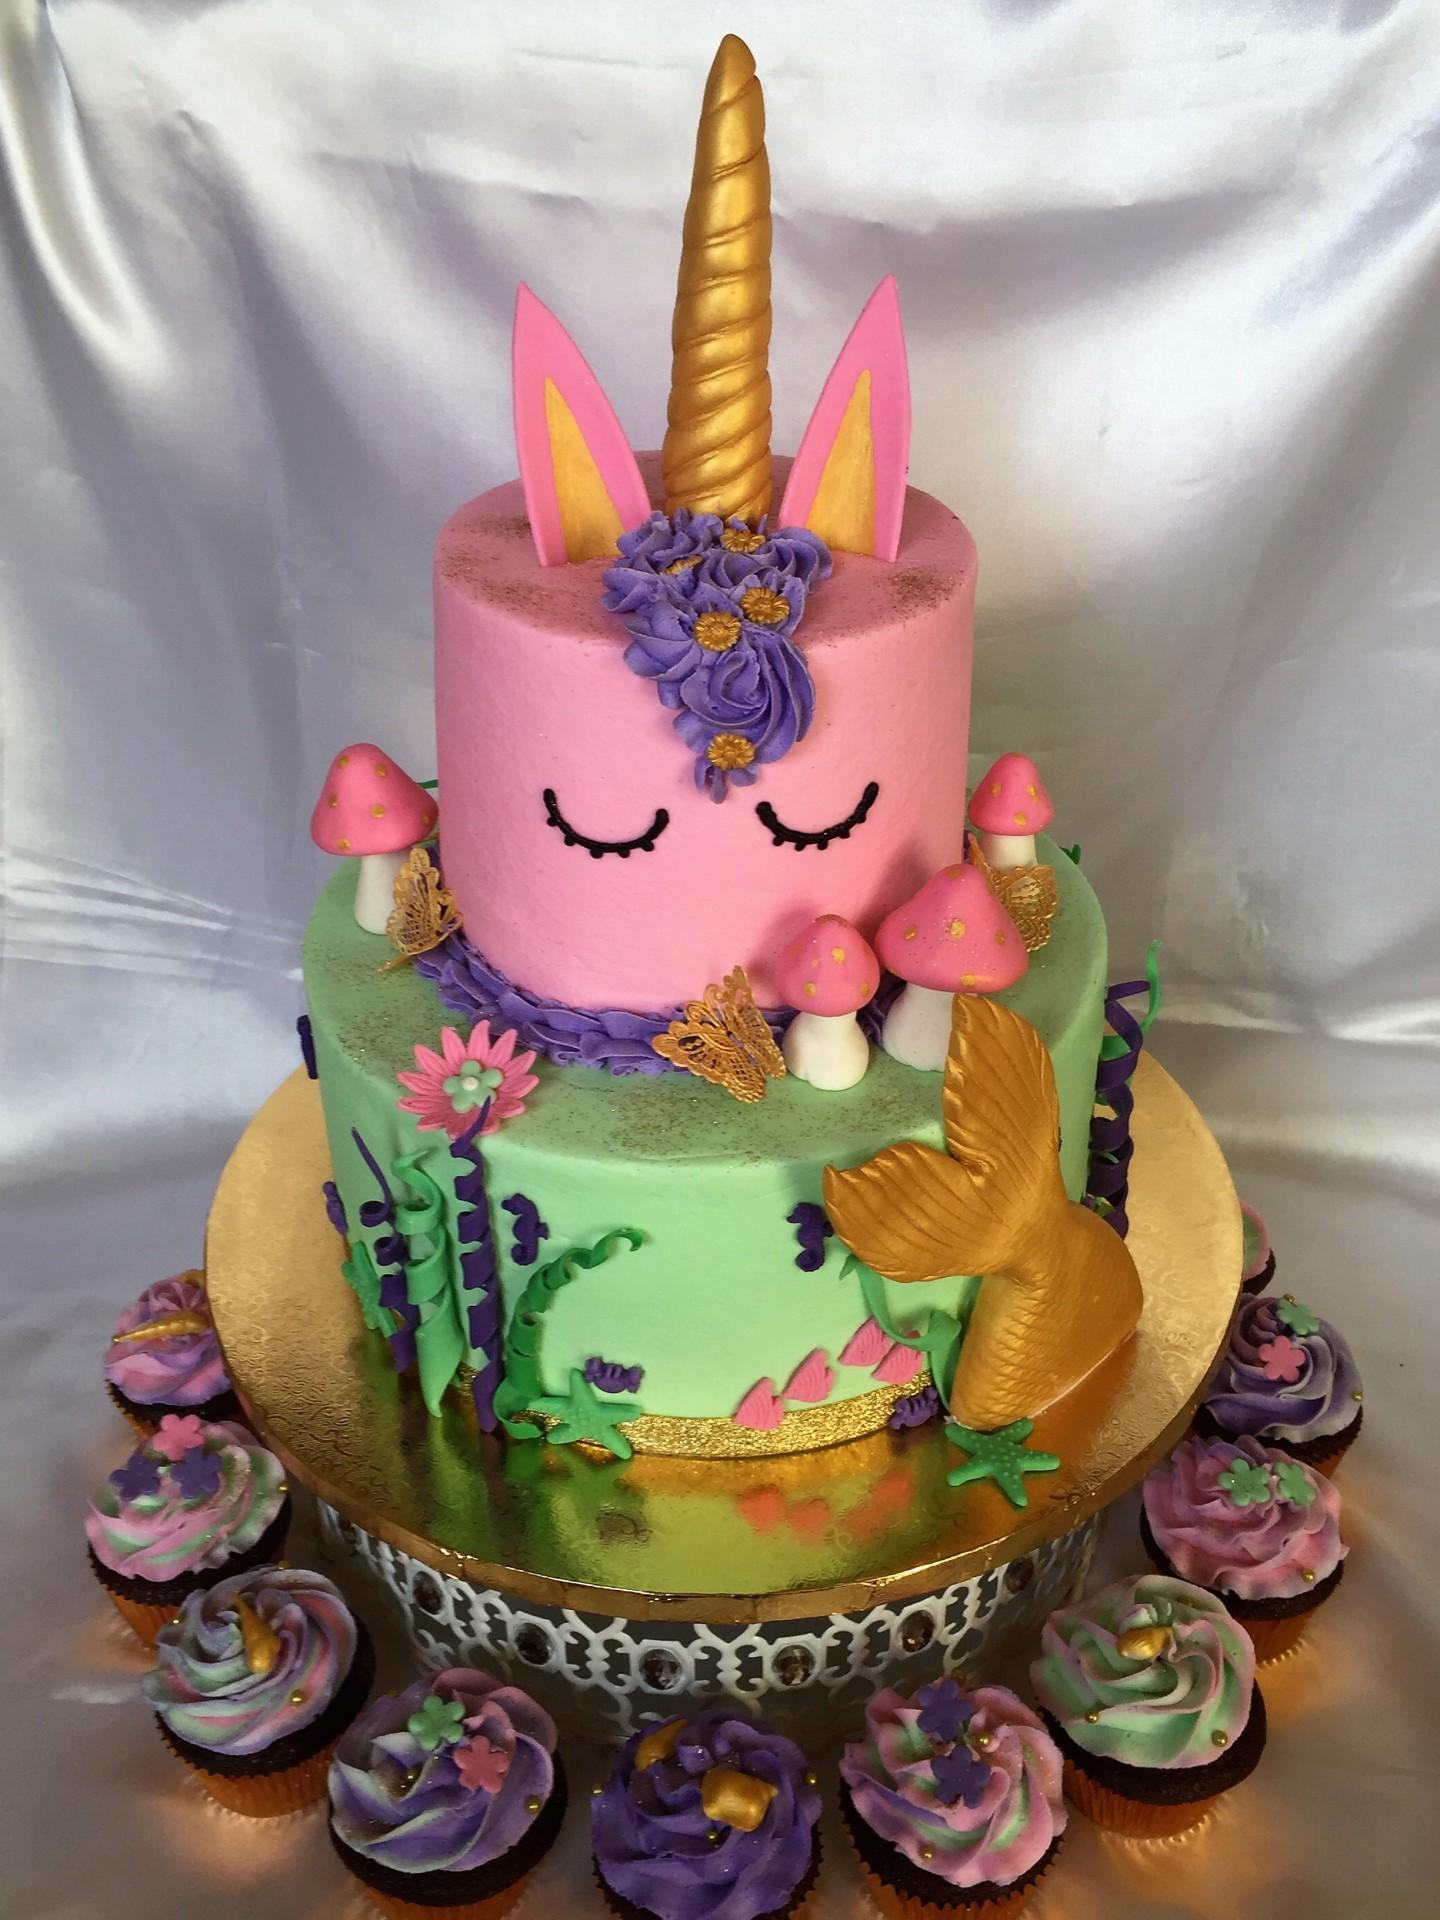 Magical theme- unicorn, fairies and mermaid